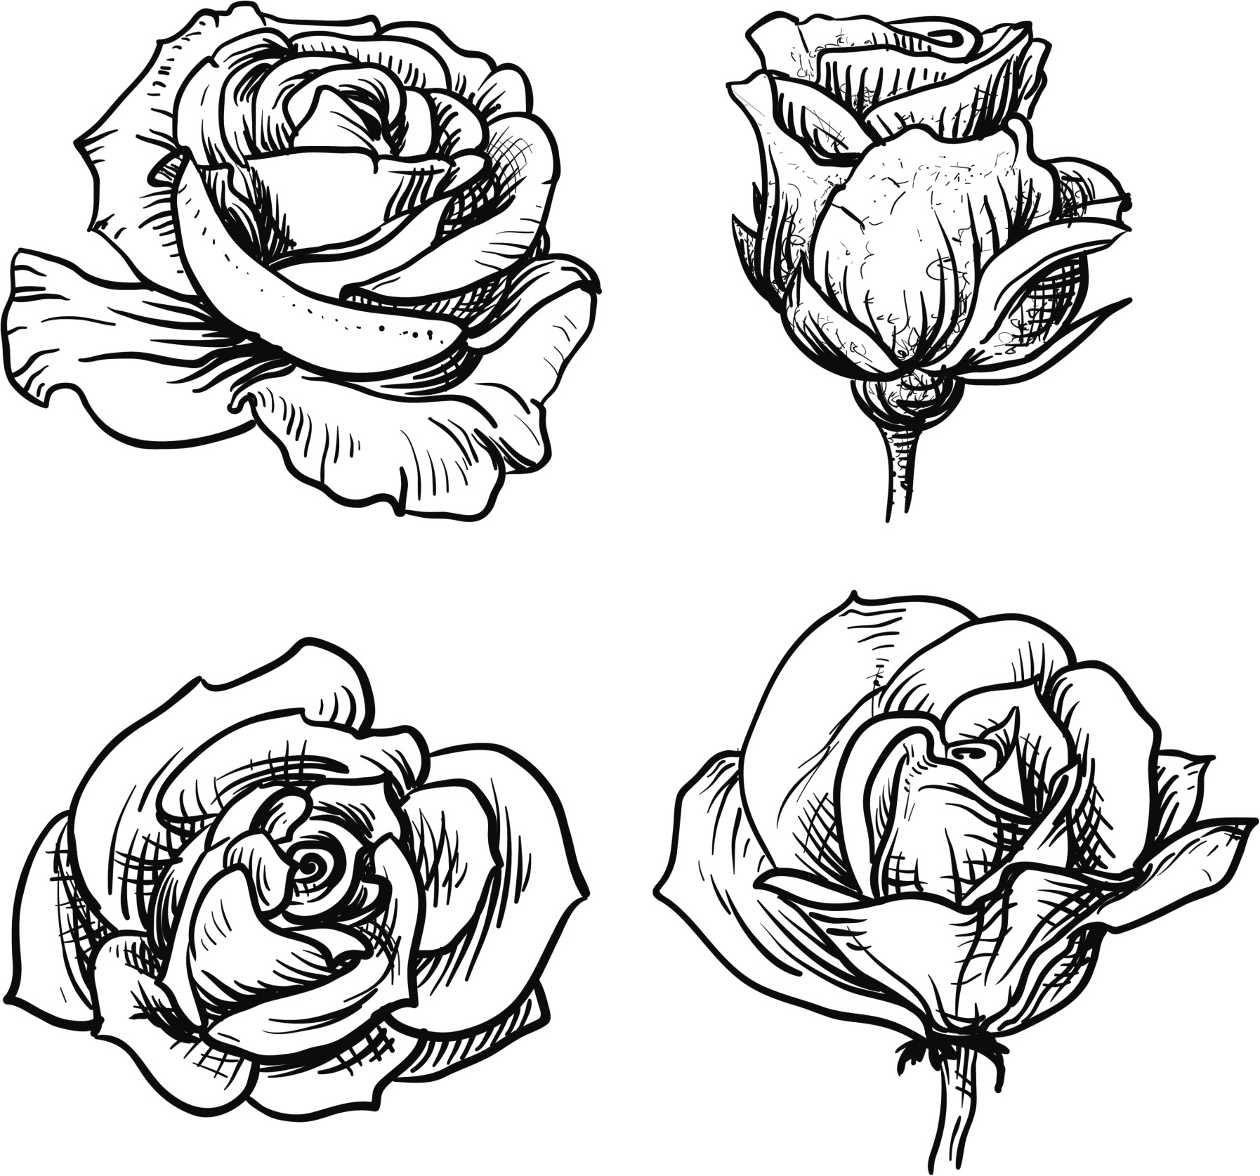 Dibujos De Rosas Para Colorear Dibujos De Rosas Dibujos De